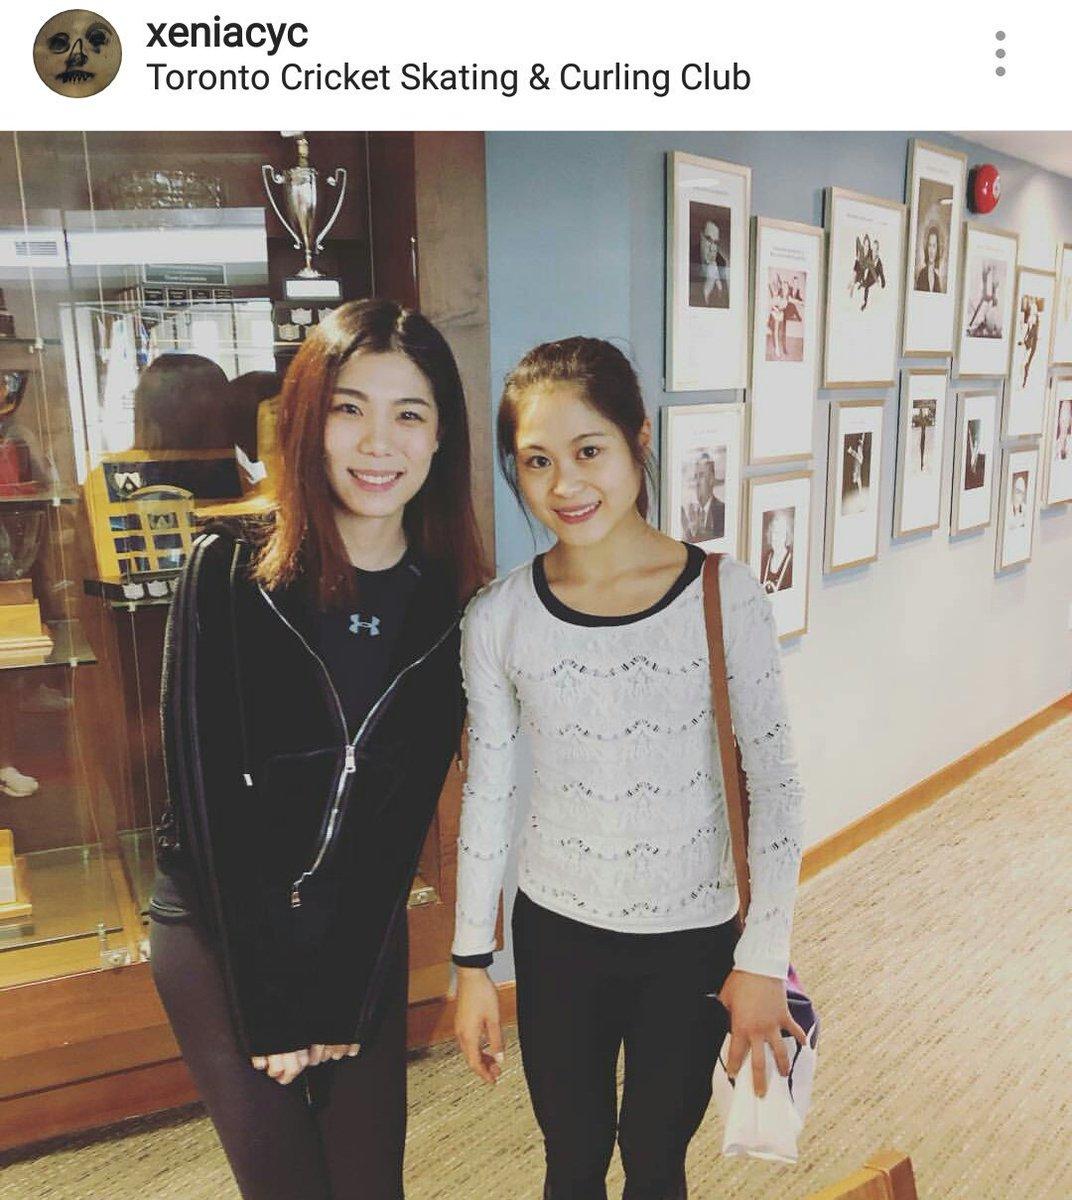 Брайан О́рсер / Brian Orser & Toronto Cricket Skating Curling Club - Страница 7 DhYLvhcU8AESIv7